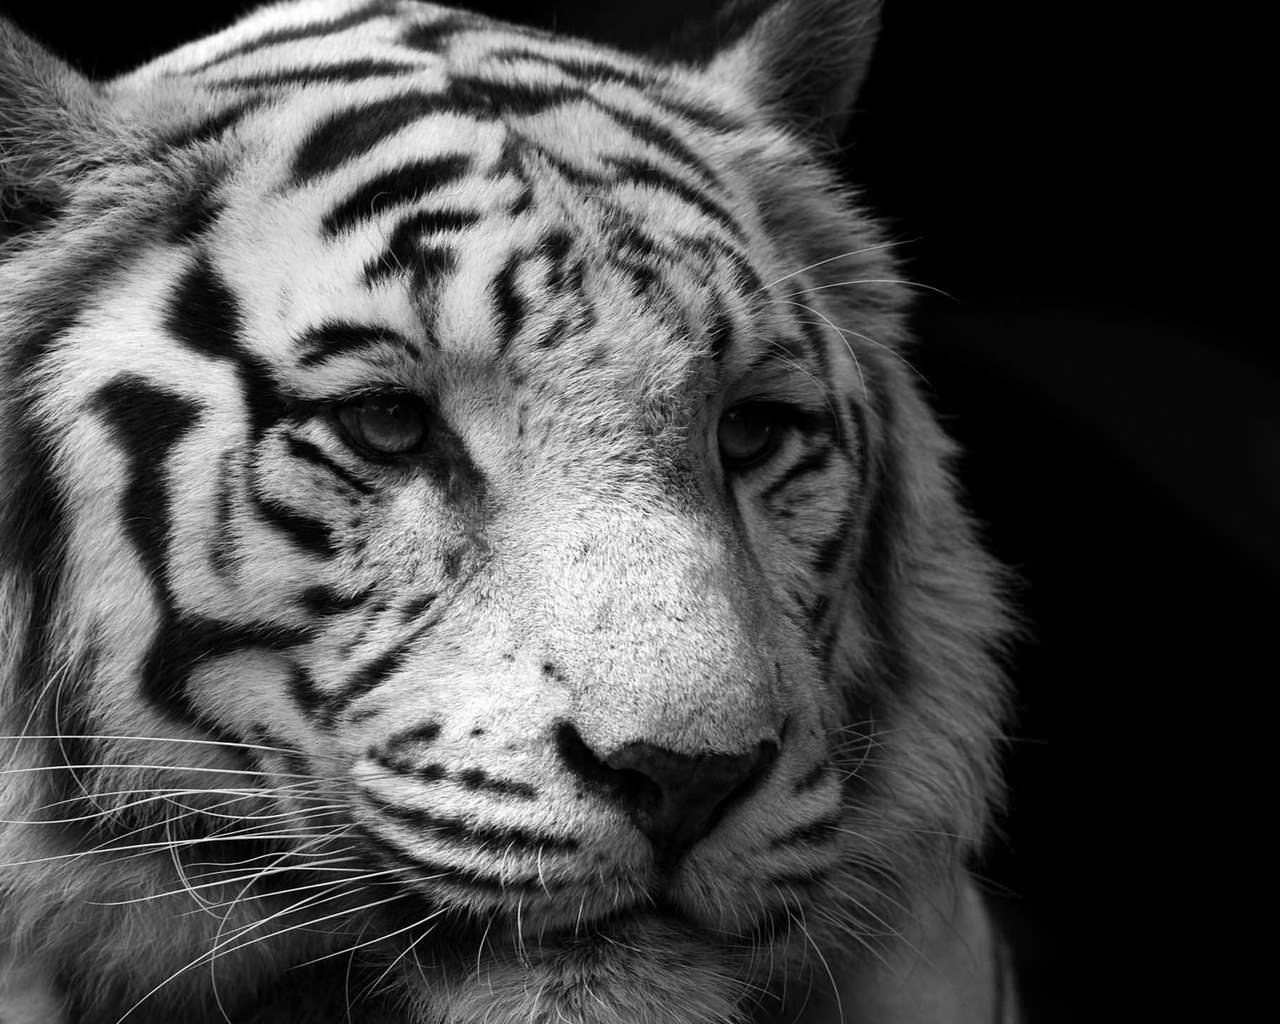 Black & White Tiger Wallpaper